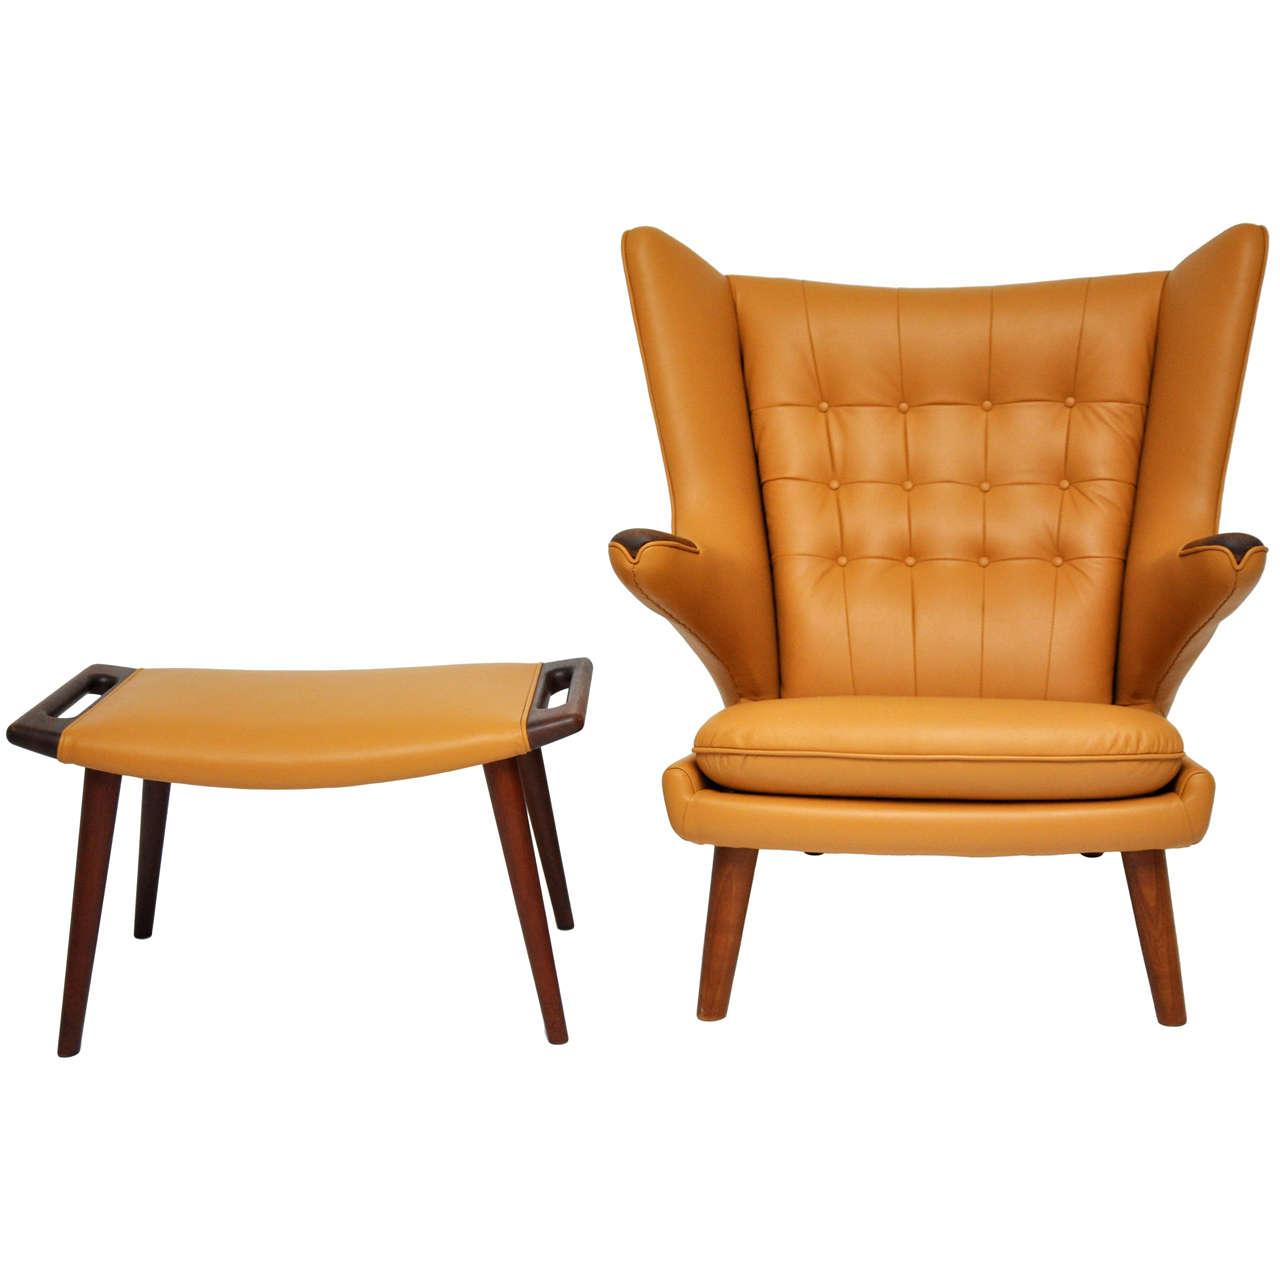 Phenomenal Hans Wegner Papa Bear Chair And Ottoman At 1Stdibs Ibusinesslaw Wood Chair Design Ideas Ibusinesslaworg